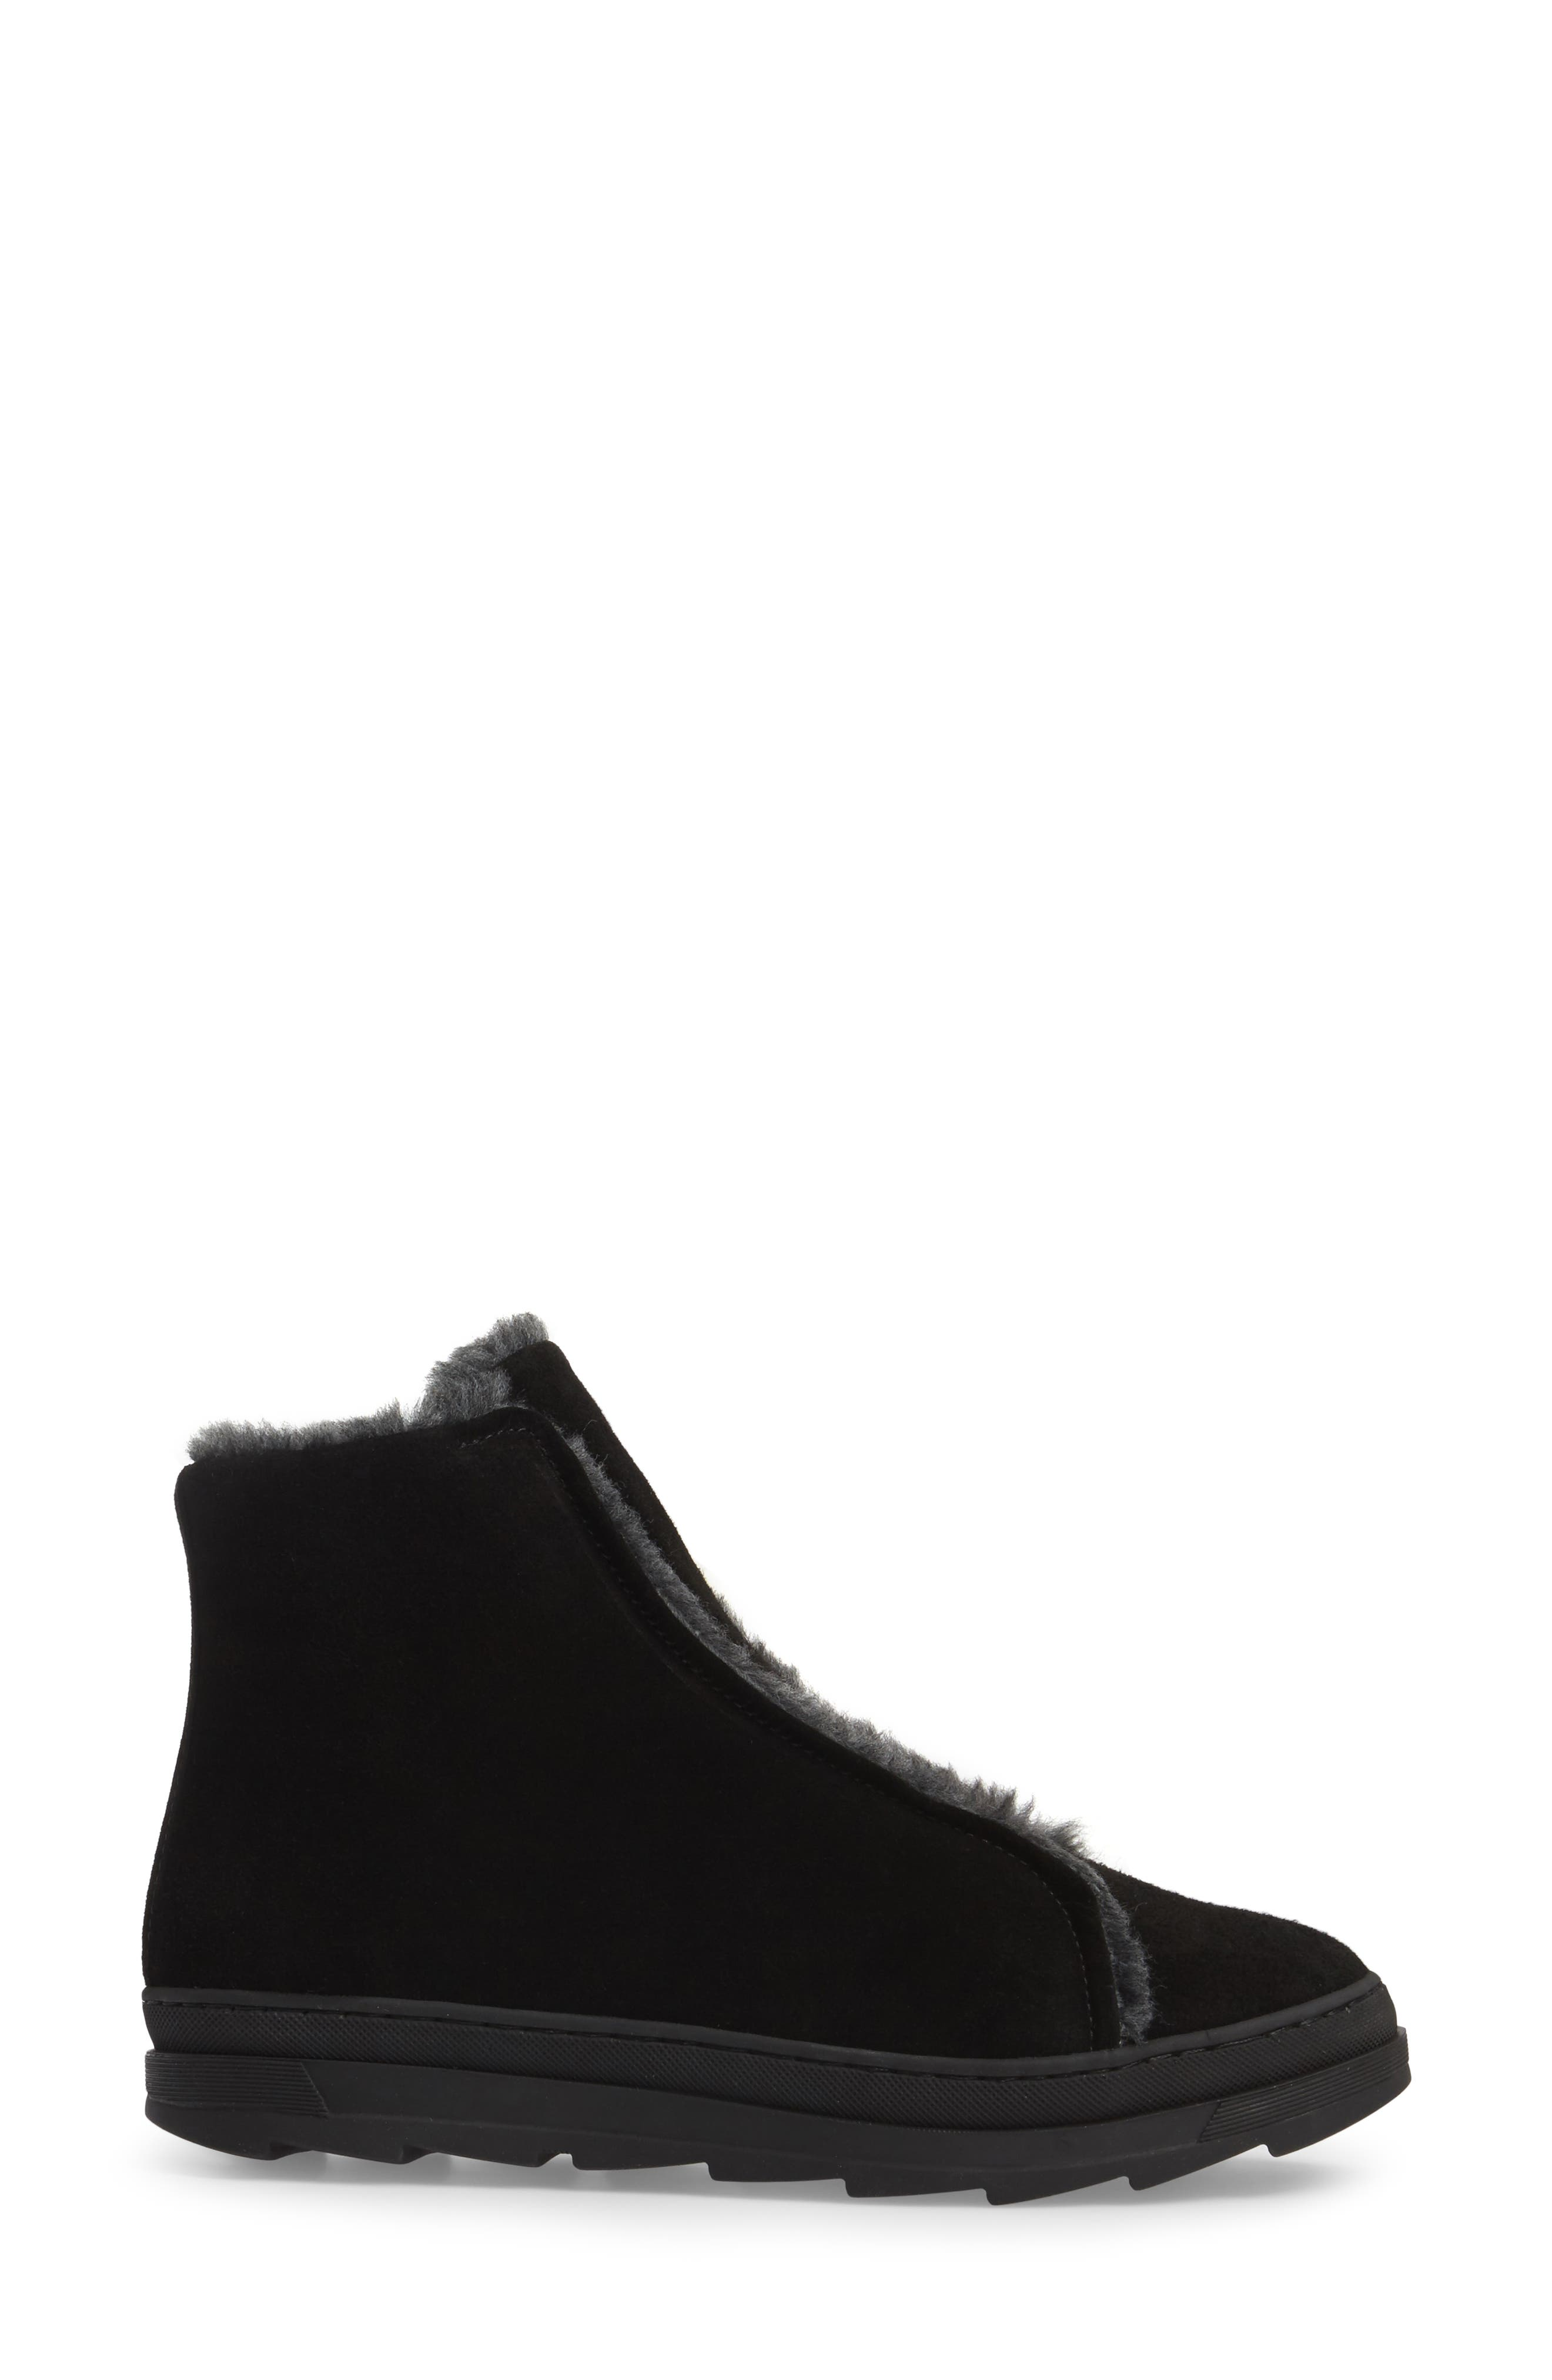 Virina Boot,                             Alternate thumbnail 3, color,                             Black Suede